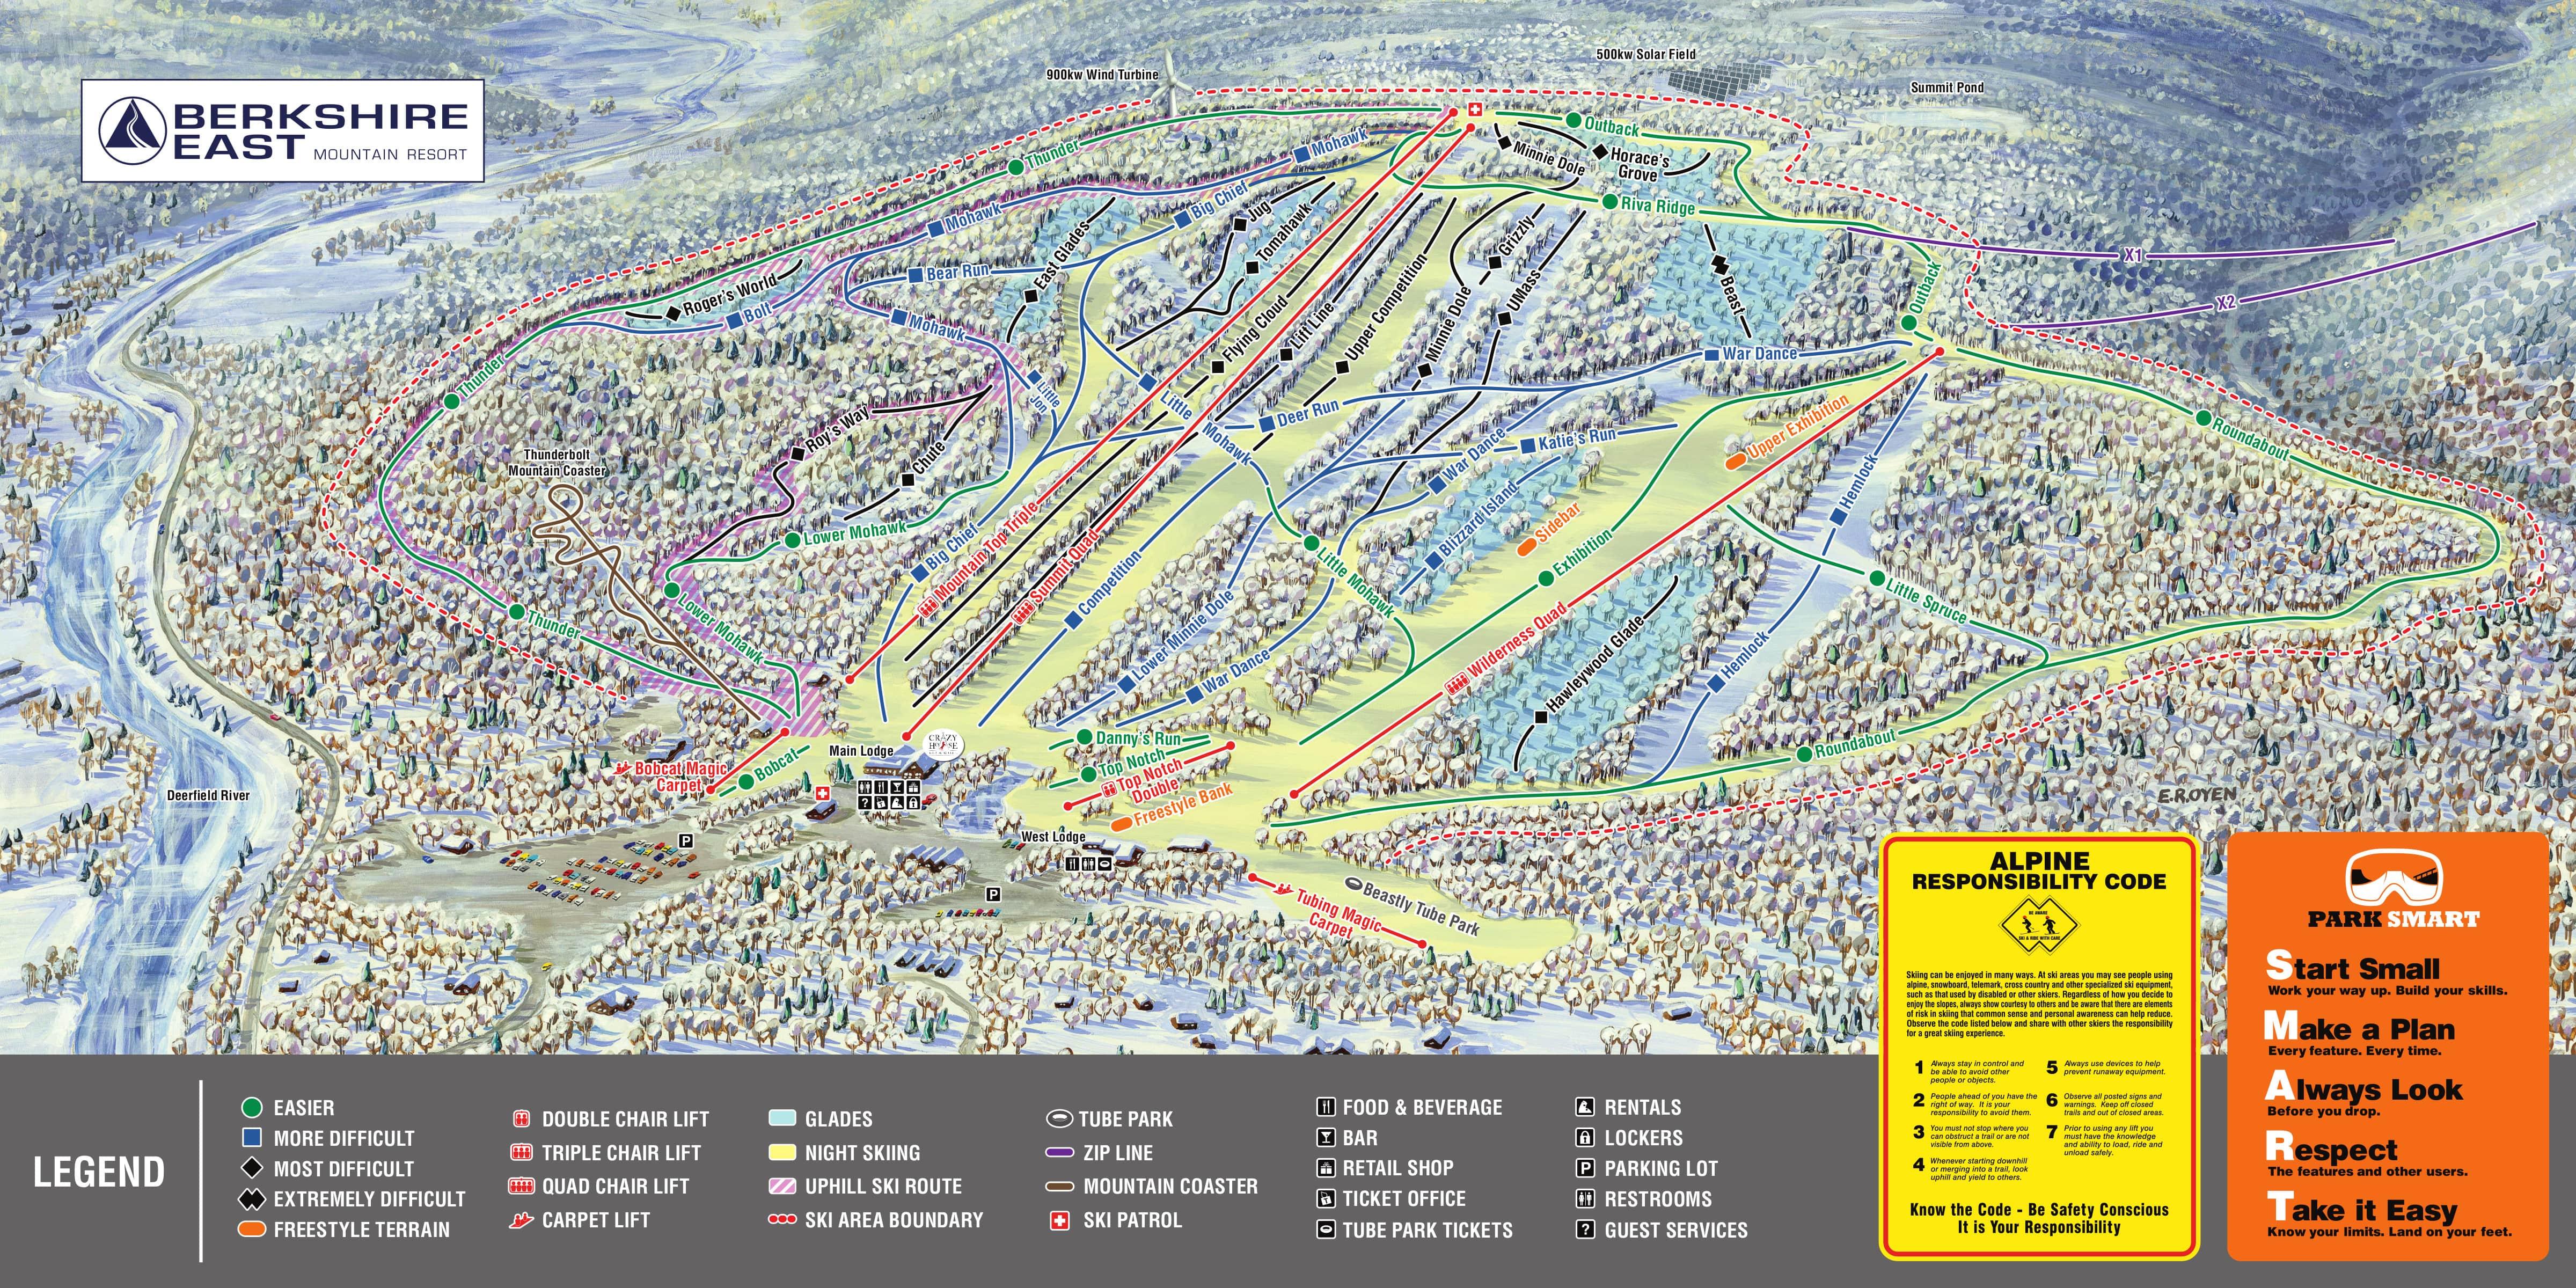 Berkshire East Piste / Trail Map